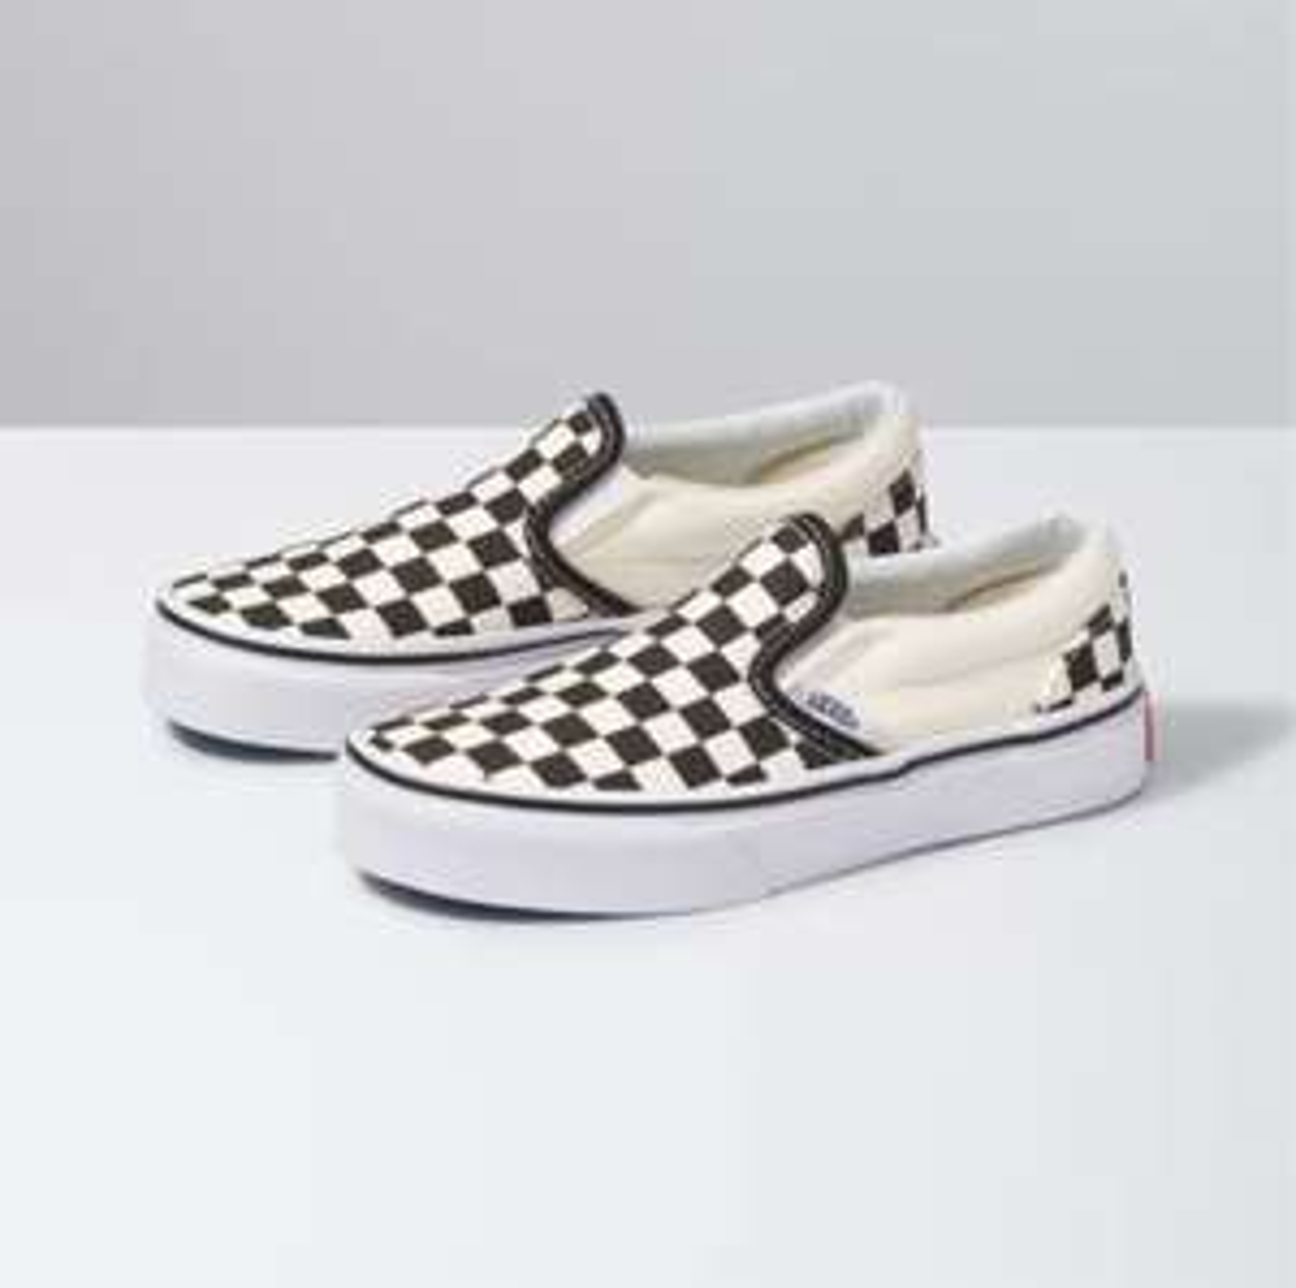 Vans Classic Slip-On Checkerboard kids sneakers voor €9,99 @ Foot Locker